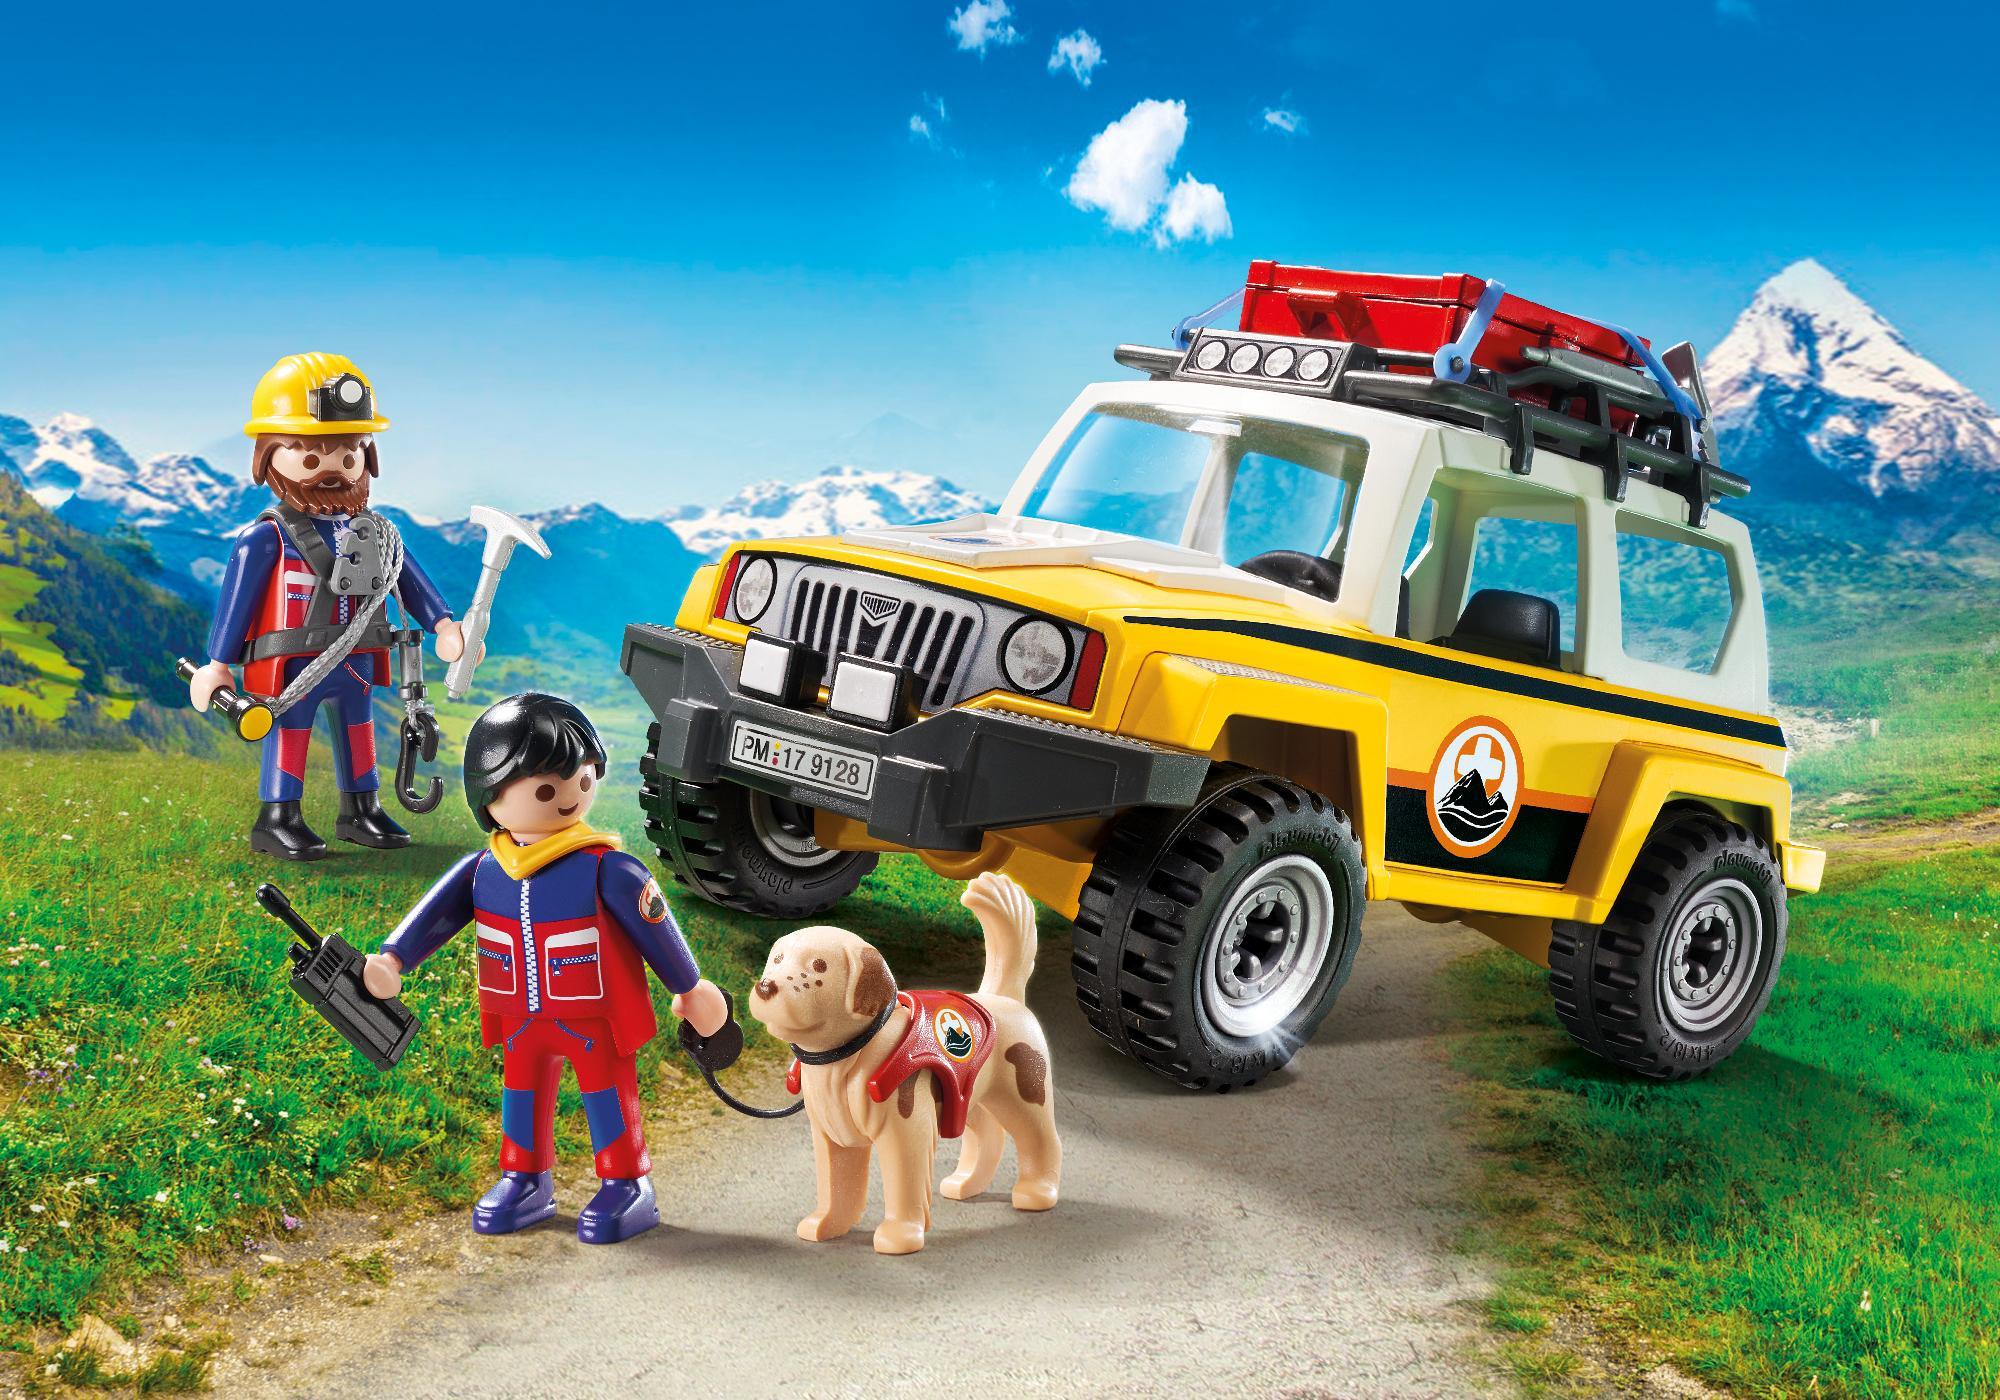 http://media.playmobil.com/i/playmobil/9128_product_detail/Mountain Rescue Truck